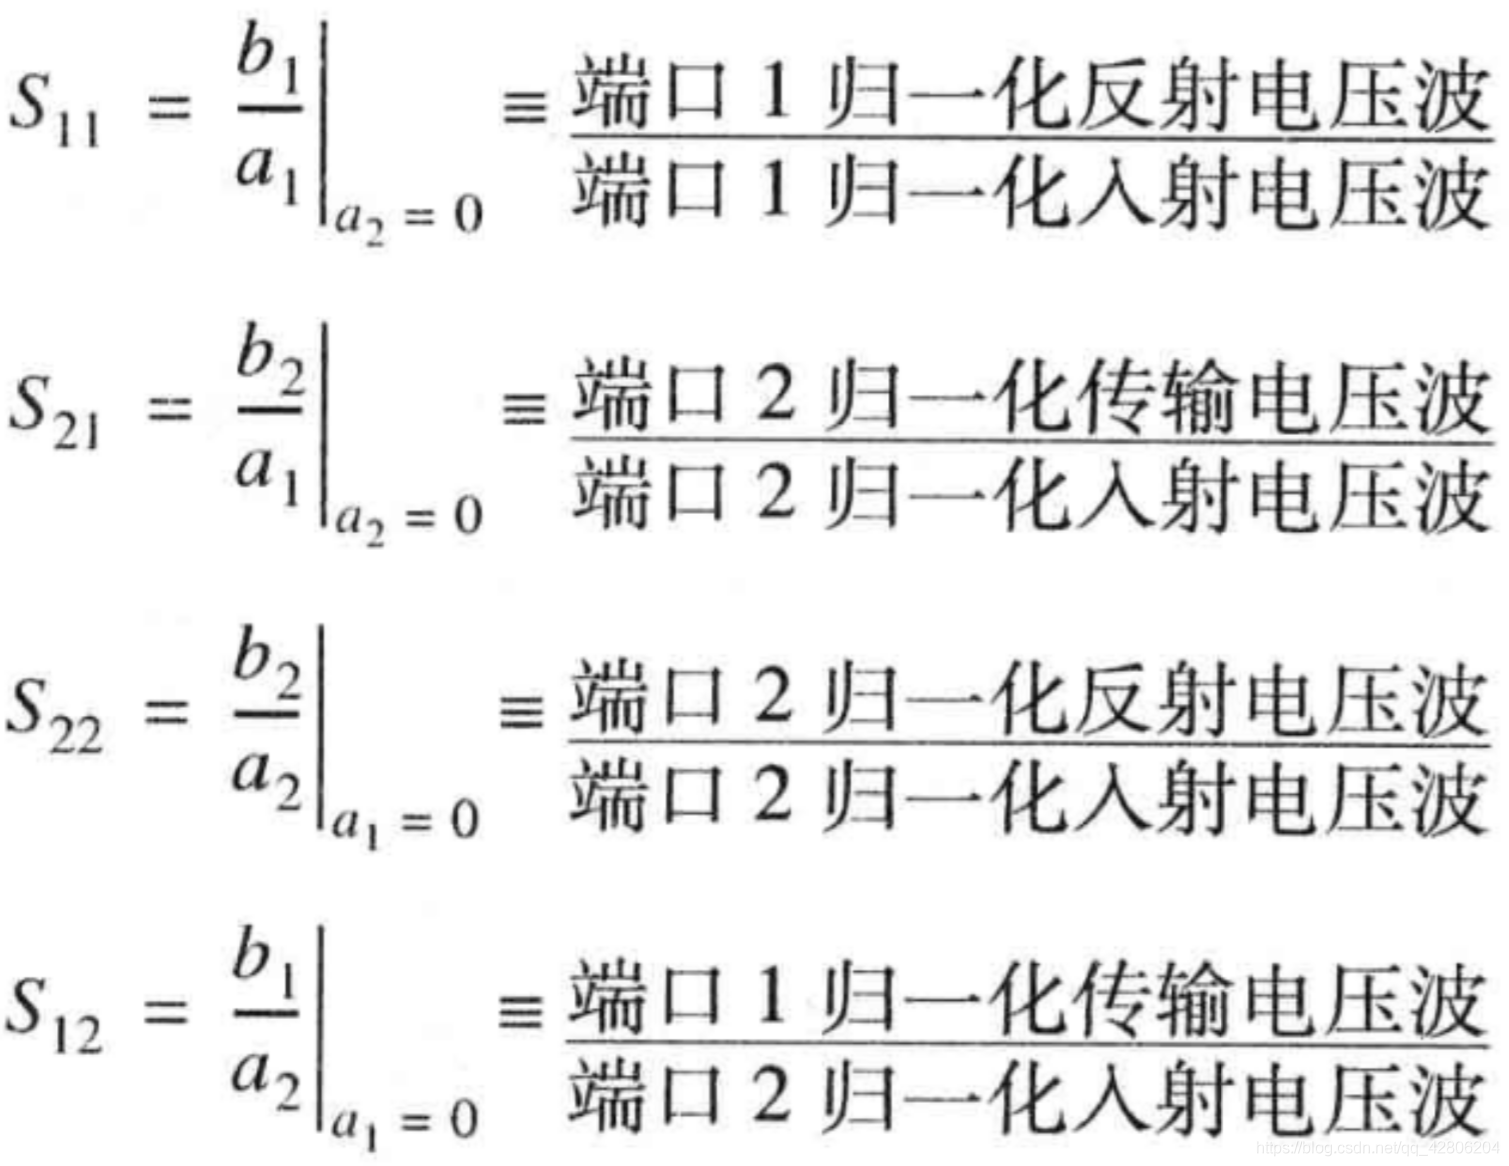 S参数定义2